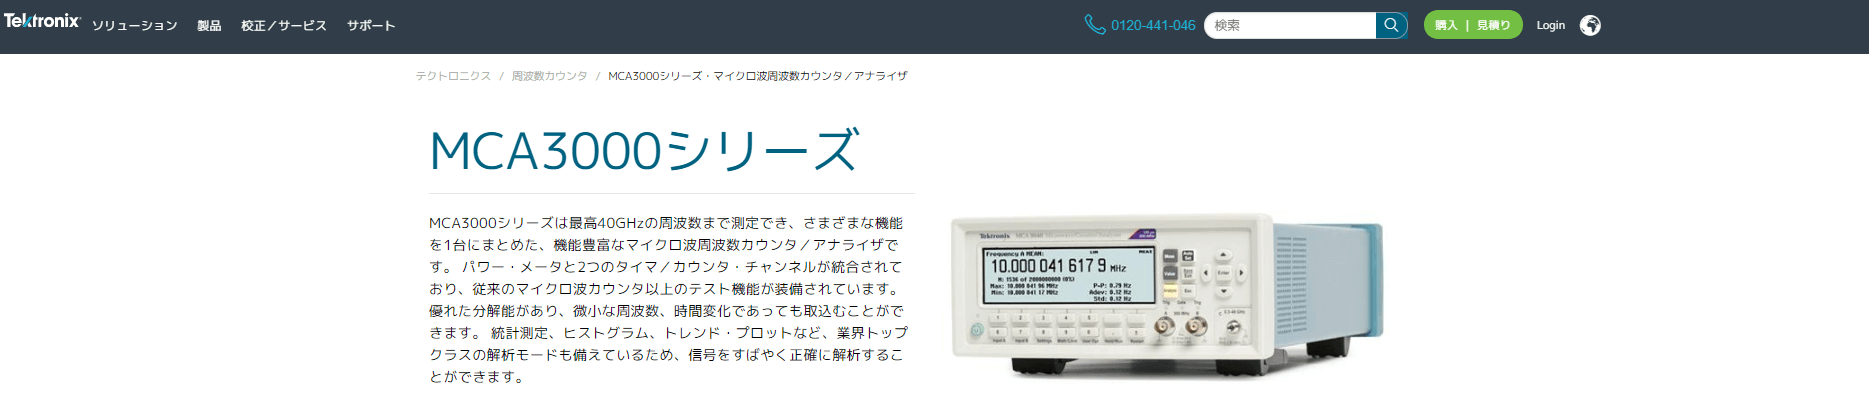 MCA3000シリーズ